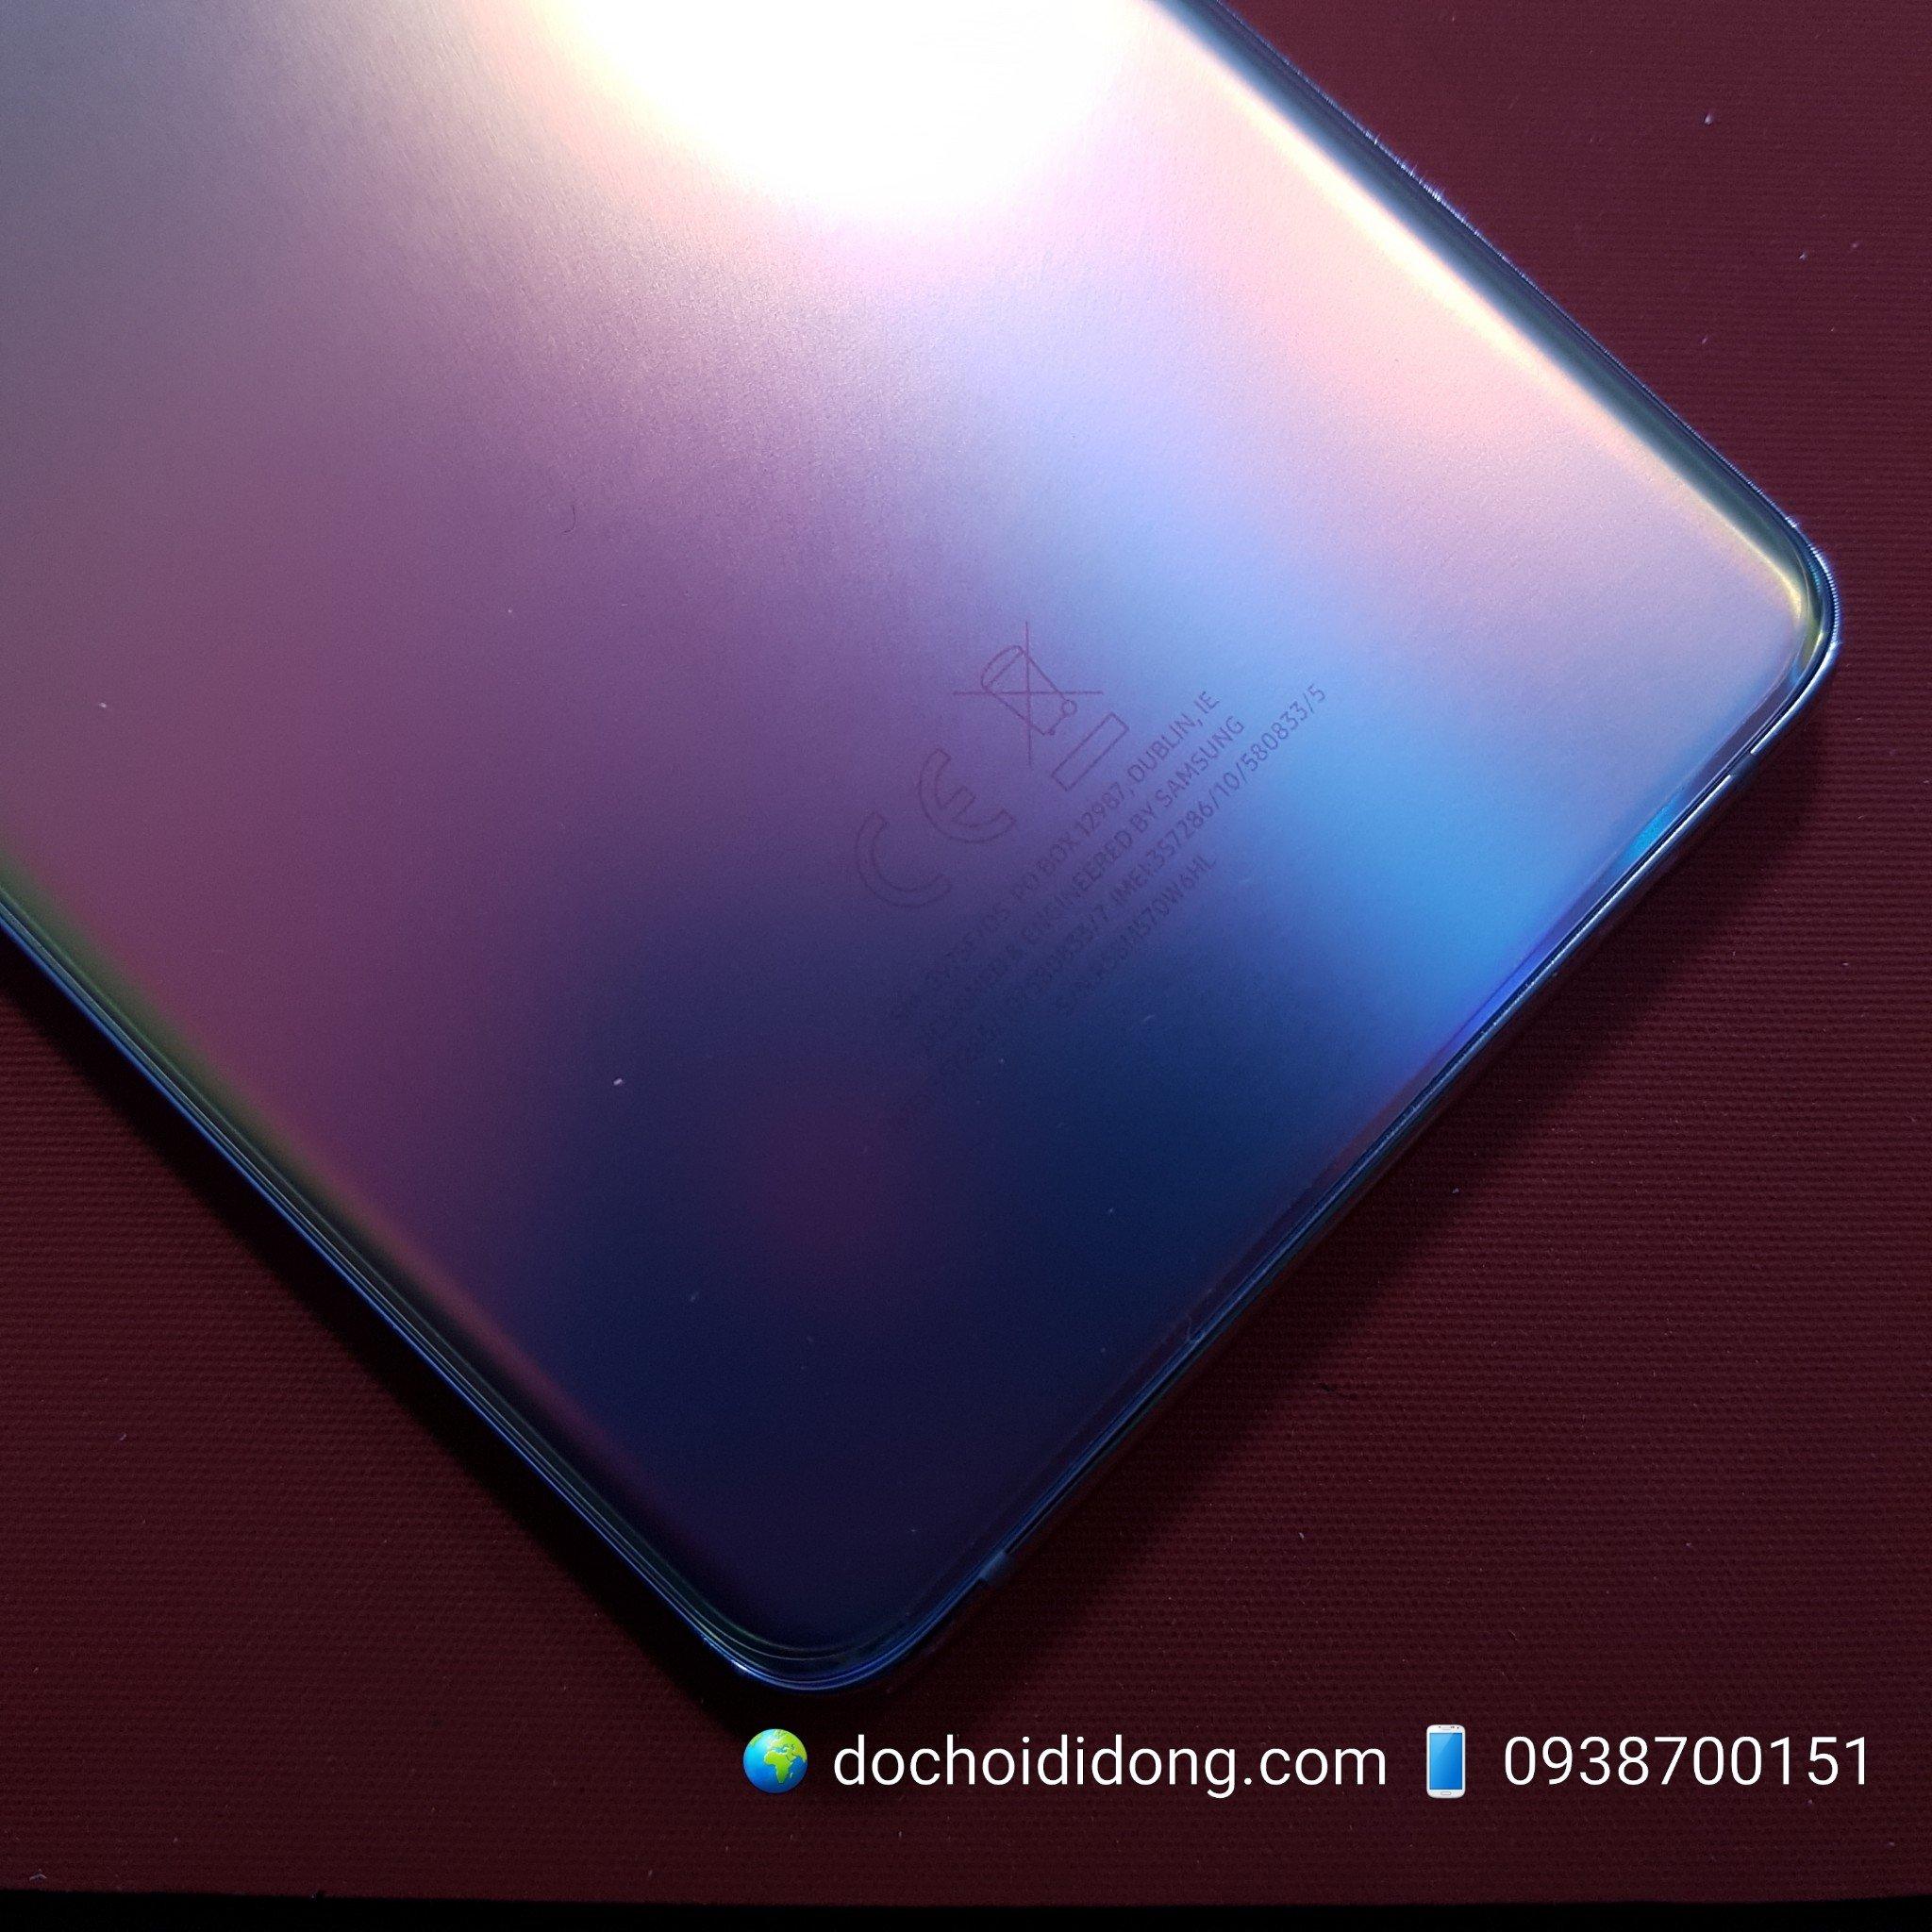 mieng-dan-lung-nham-trong-samsung-s10-plus-matte-flexible